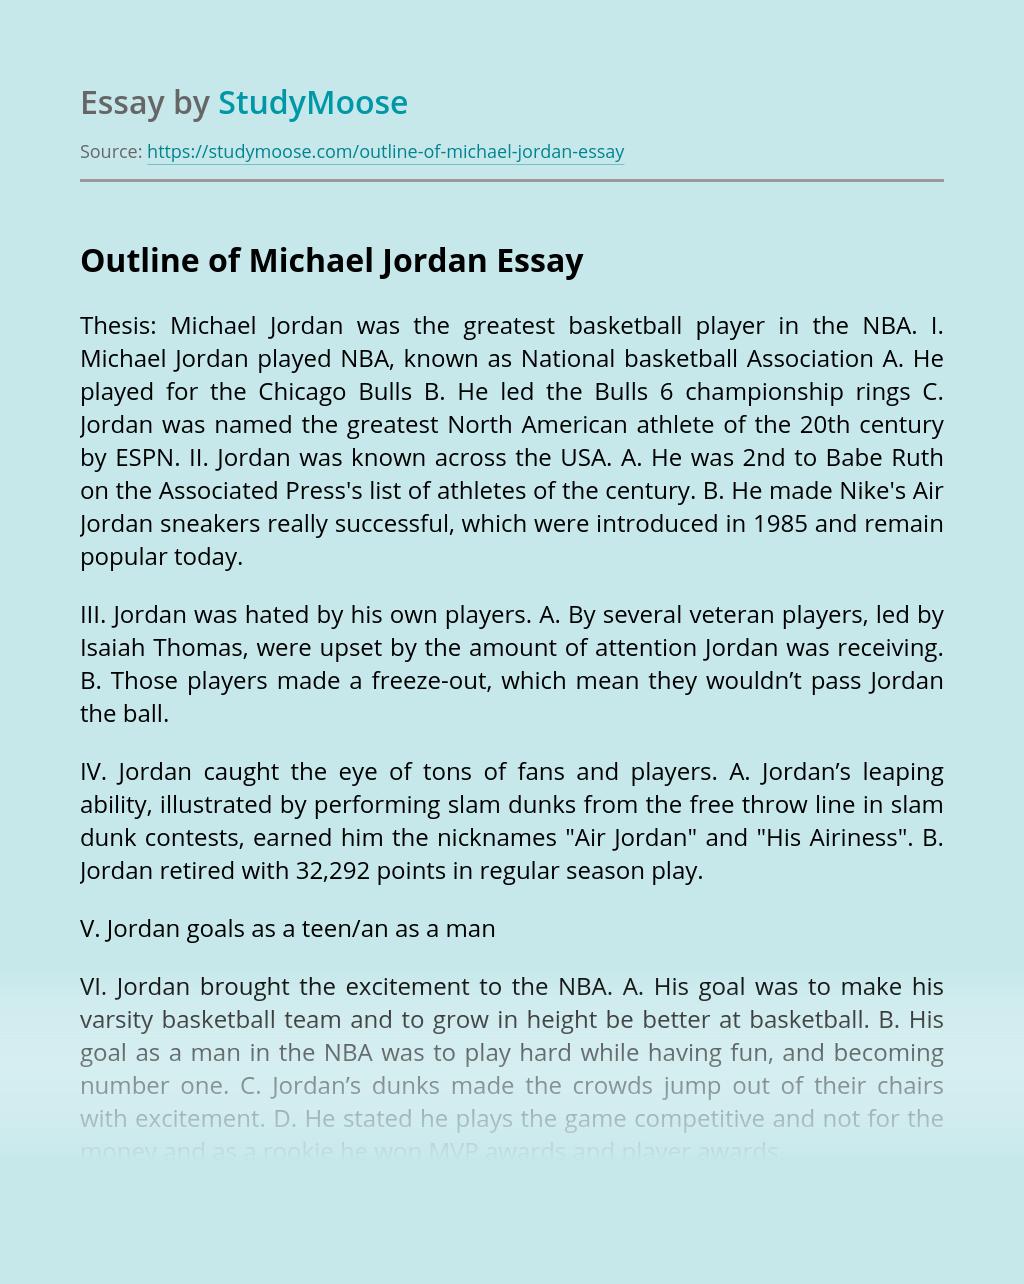 Outline of Michael Jordan